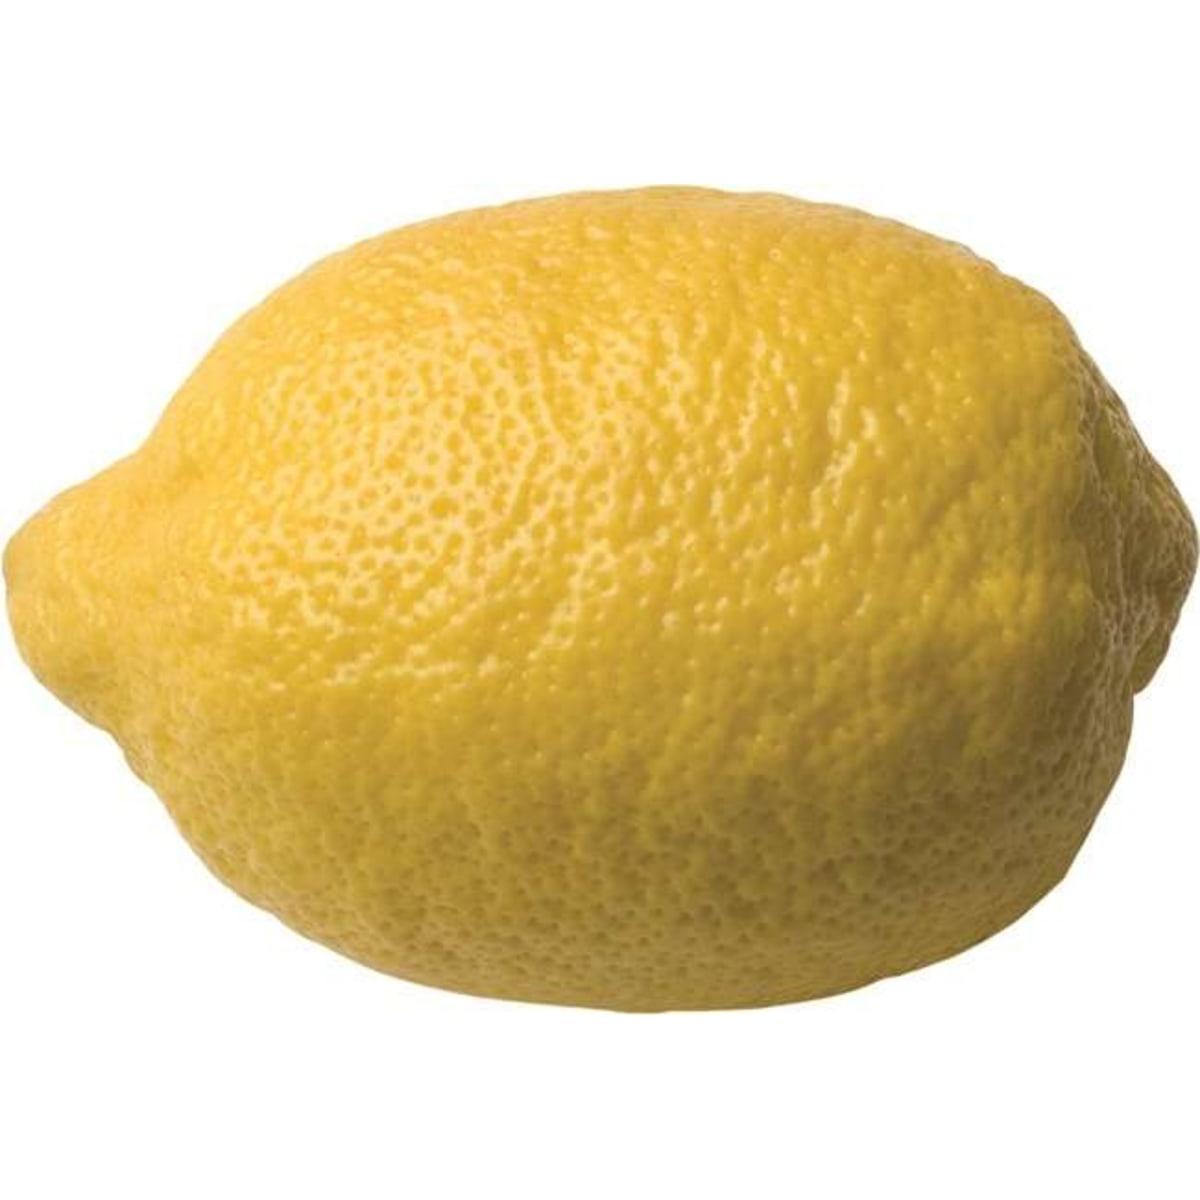 Zitronen Lose